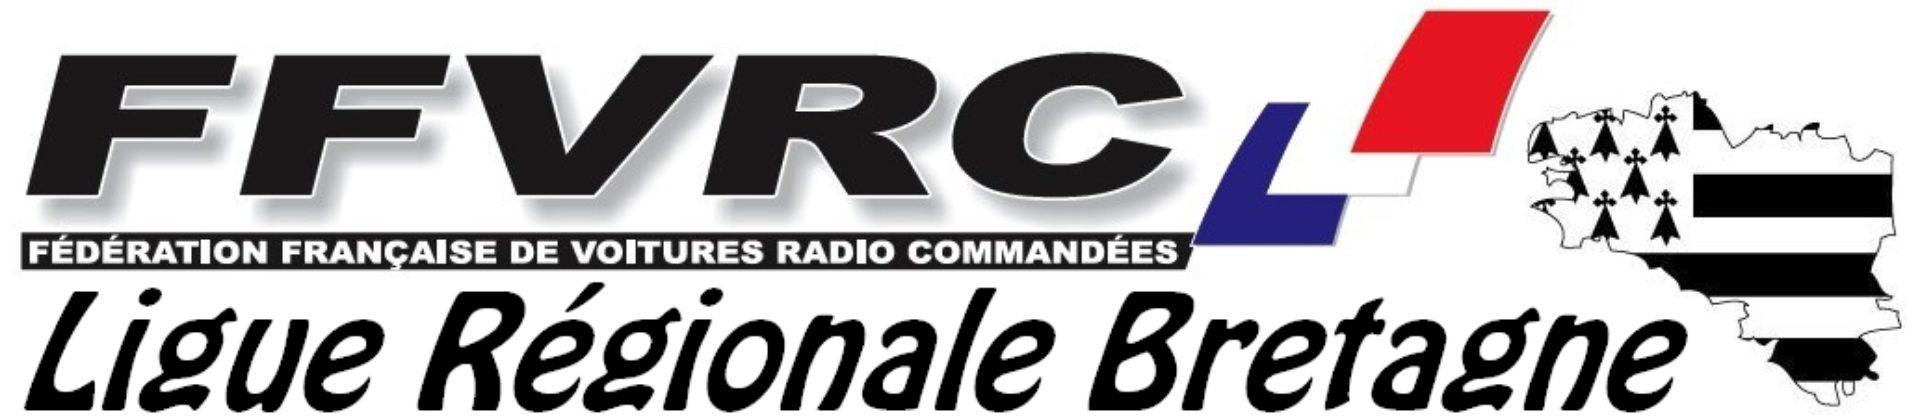 FFVRC Bretagne L19